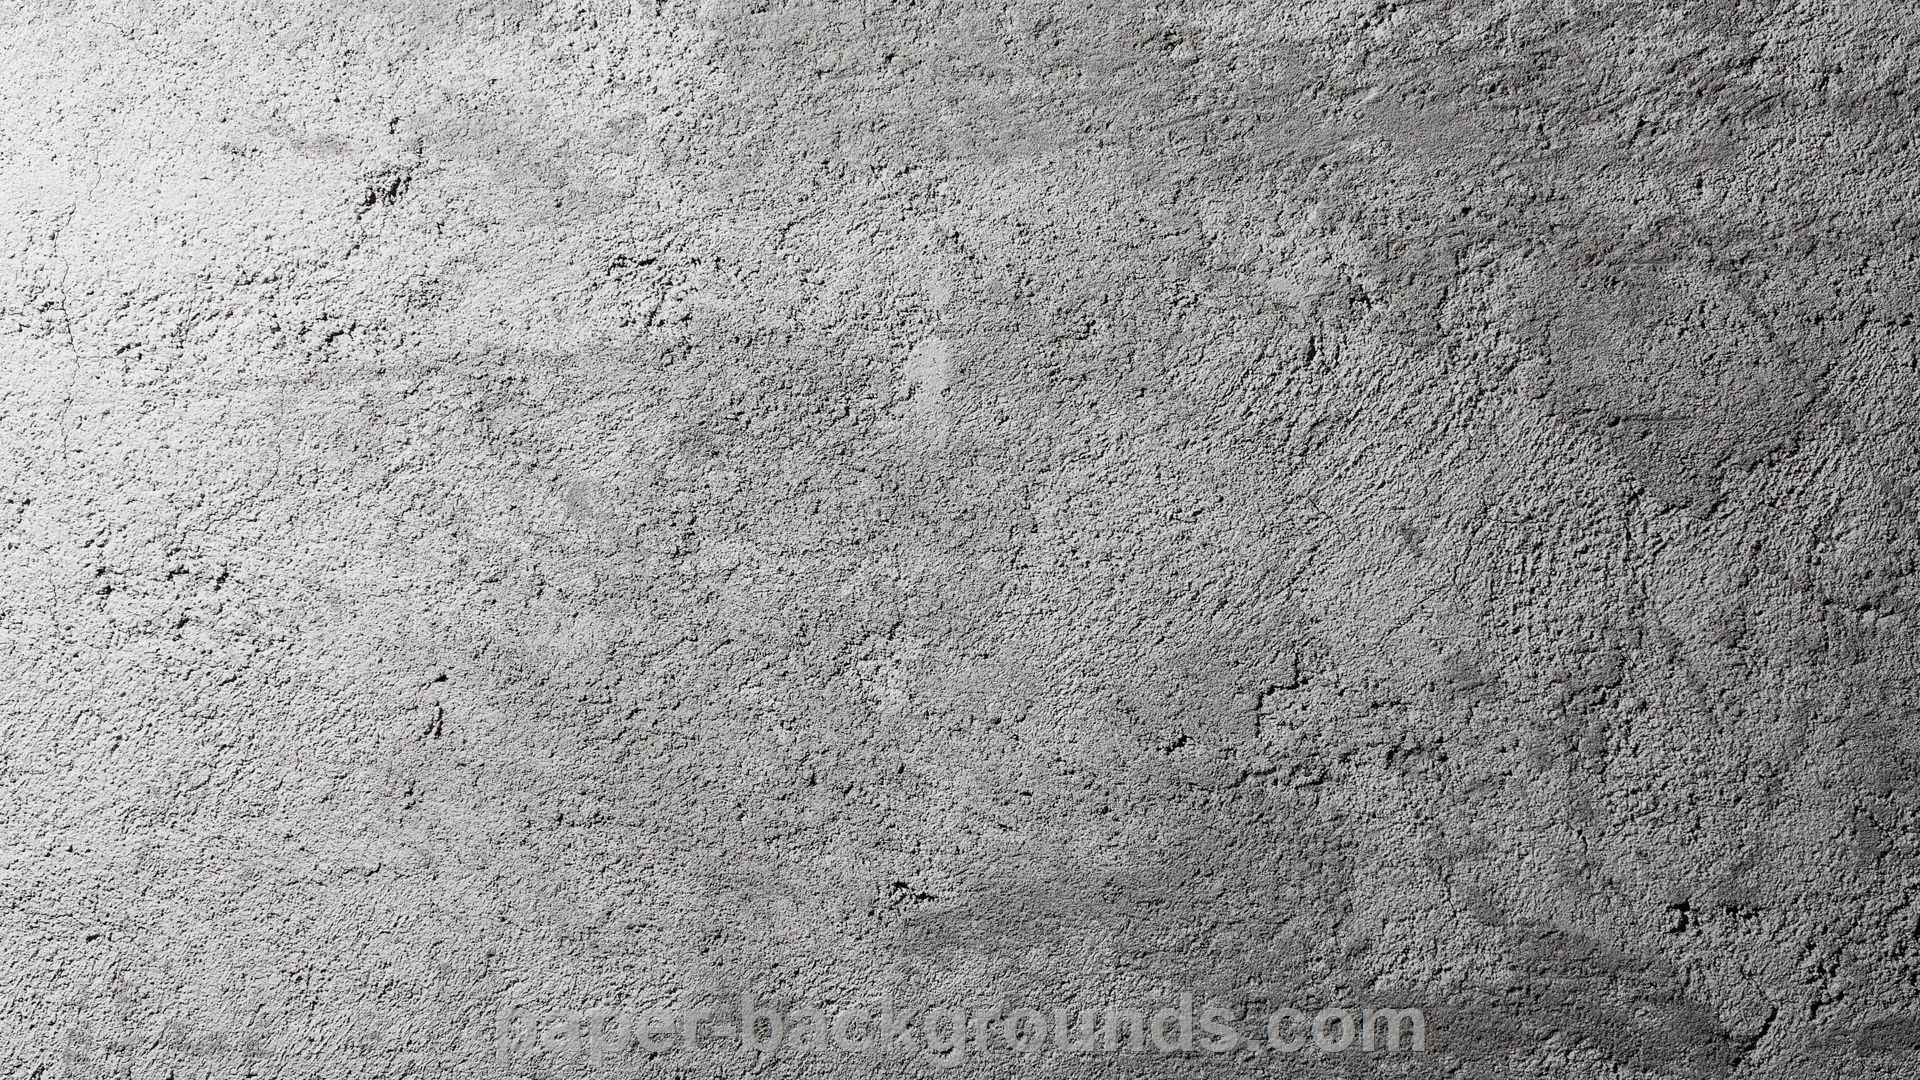 gray-concrete-texture-hd.jpg (1920×1080) | ArtBusking | Pinterest